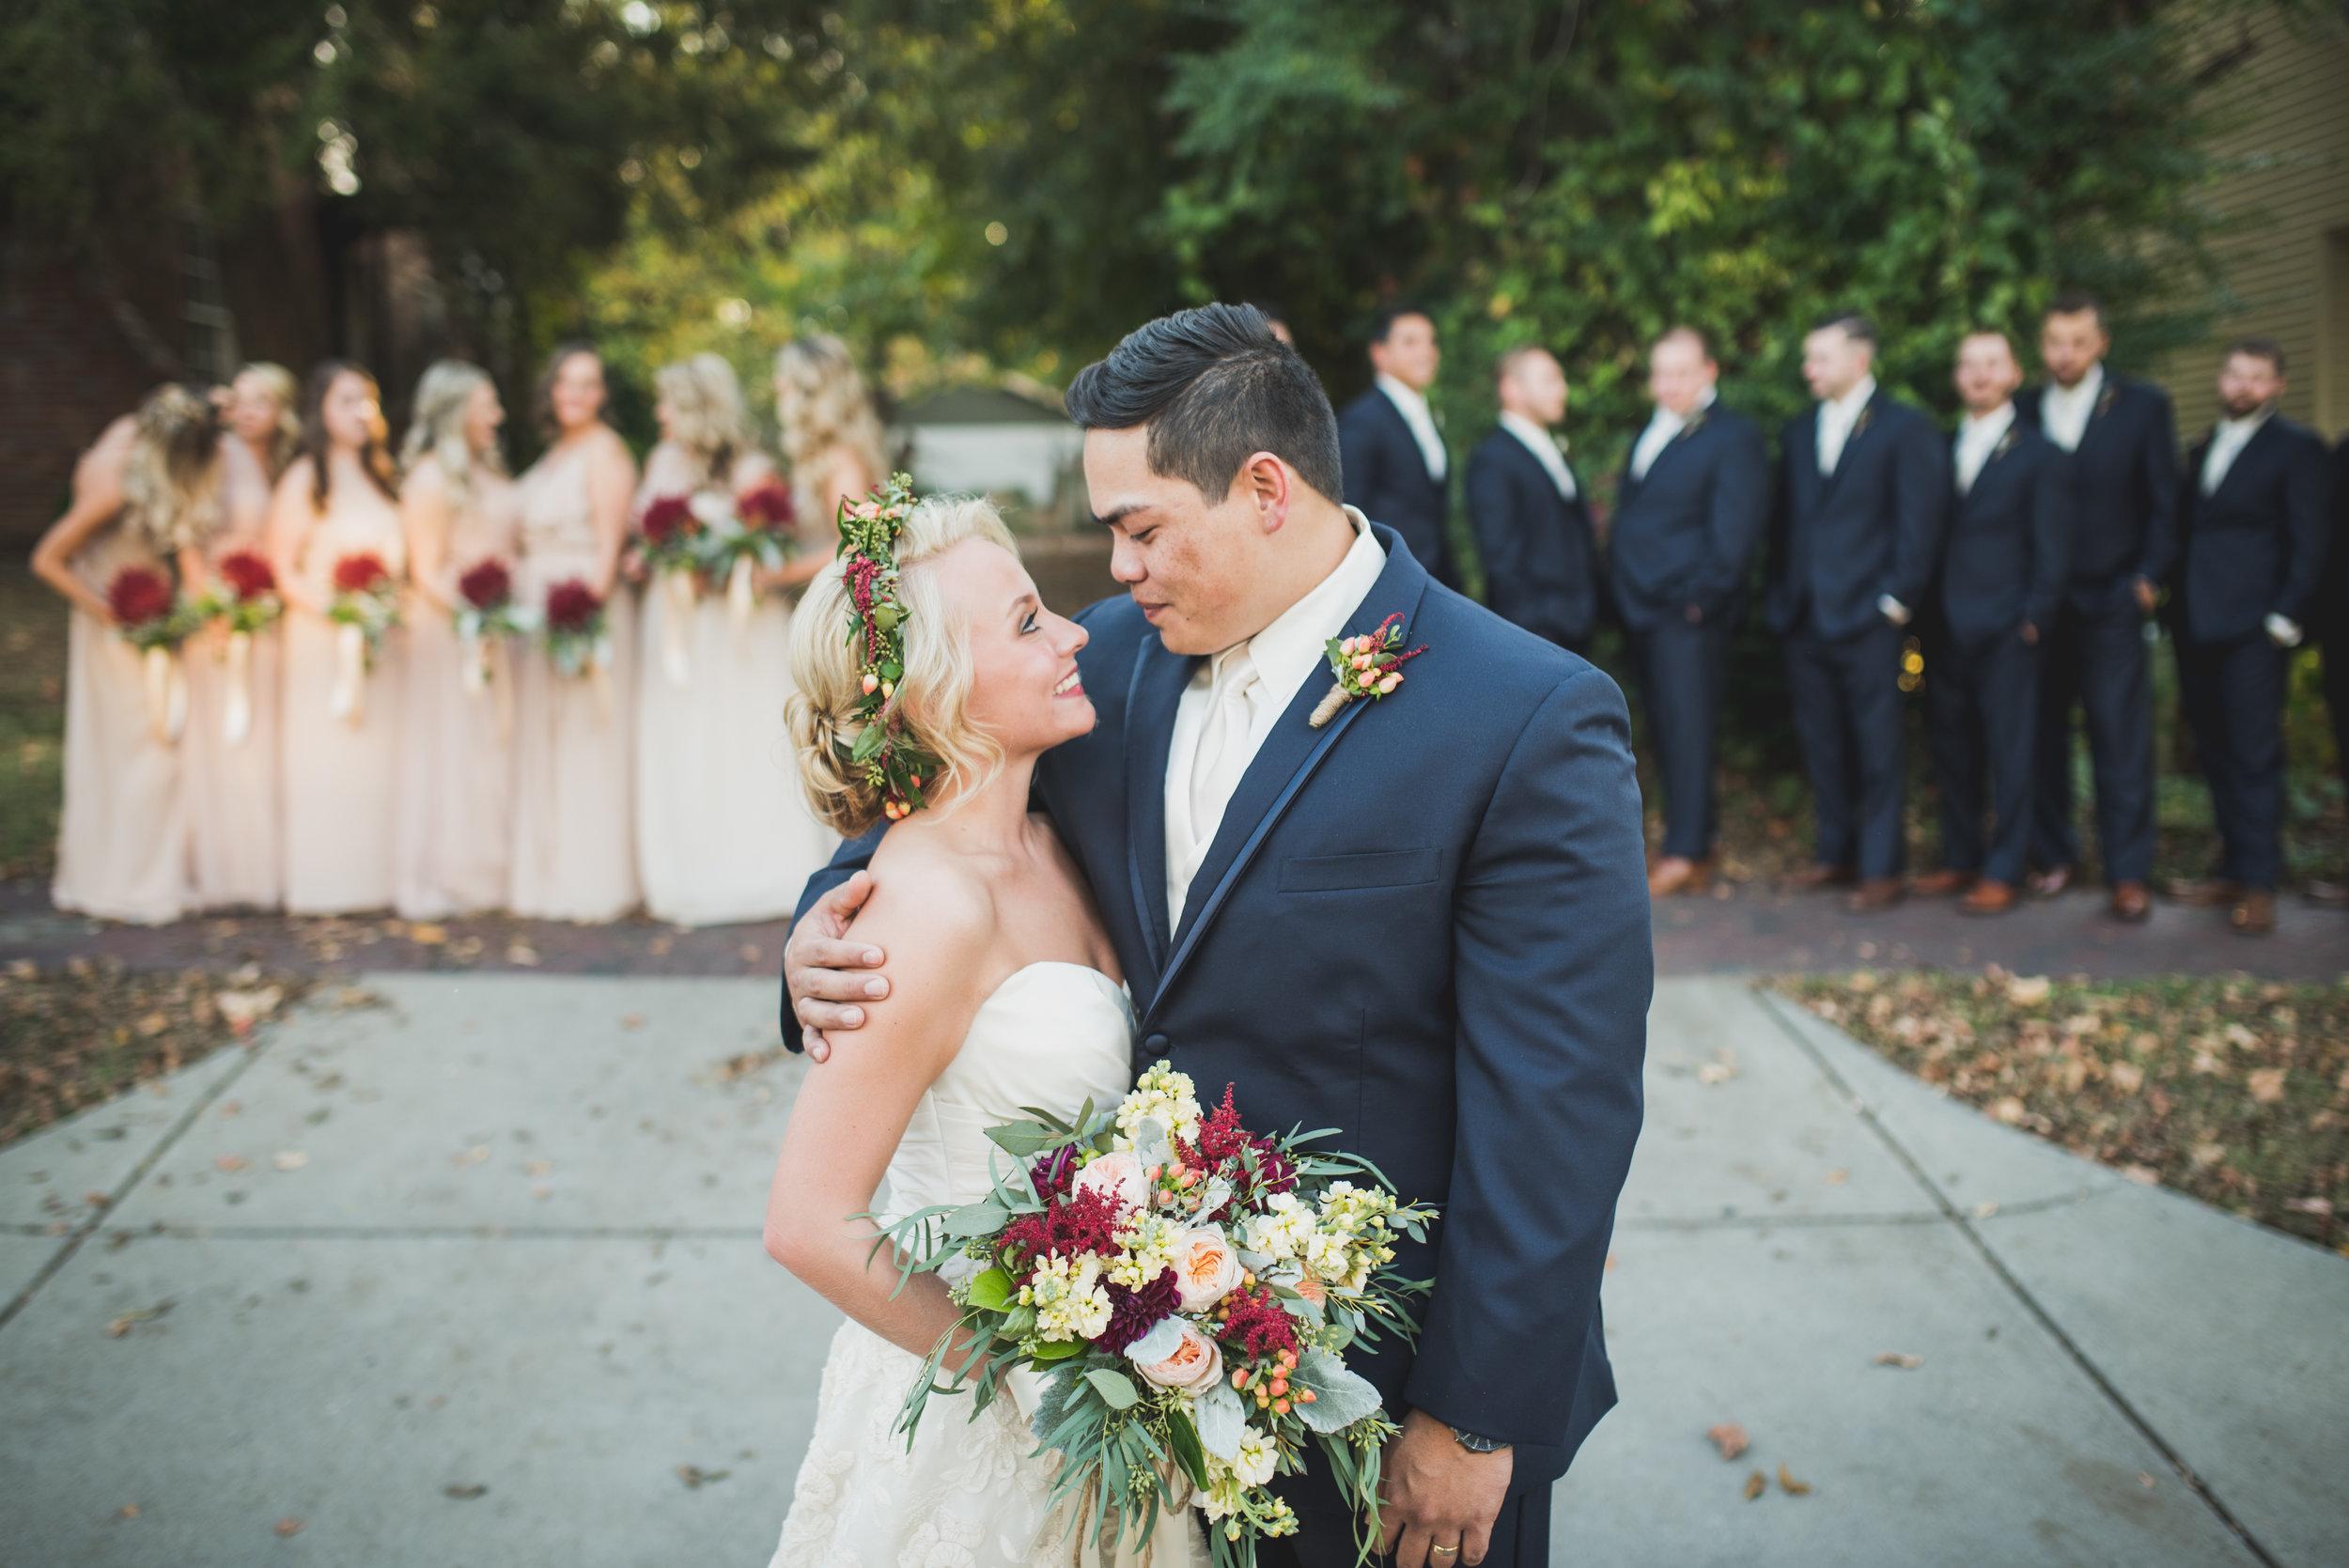 Nashville-wedding-photographers-CJ's-Off-The-Square-41.JPG